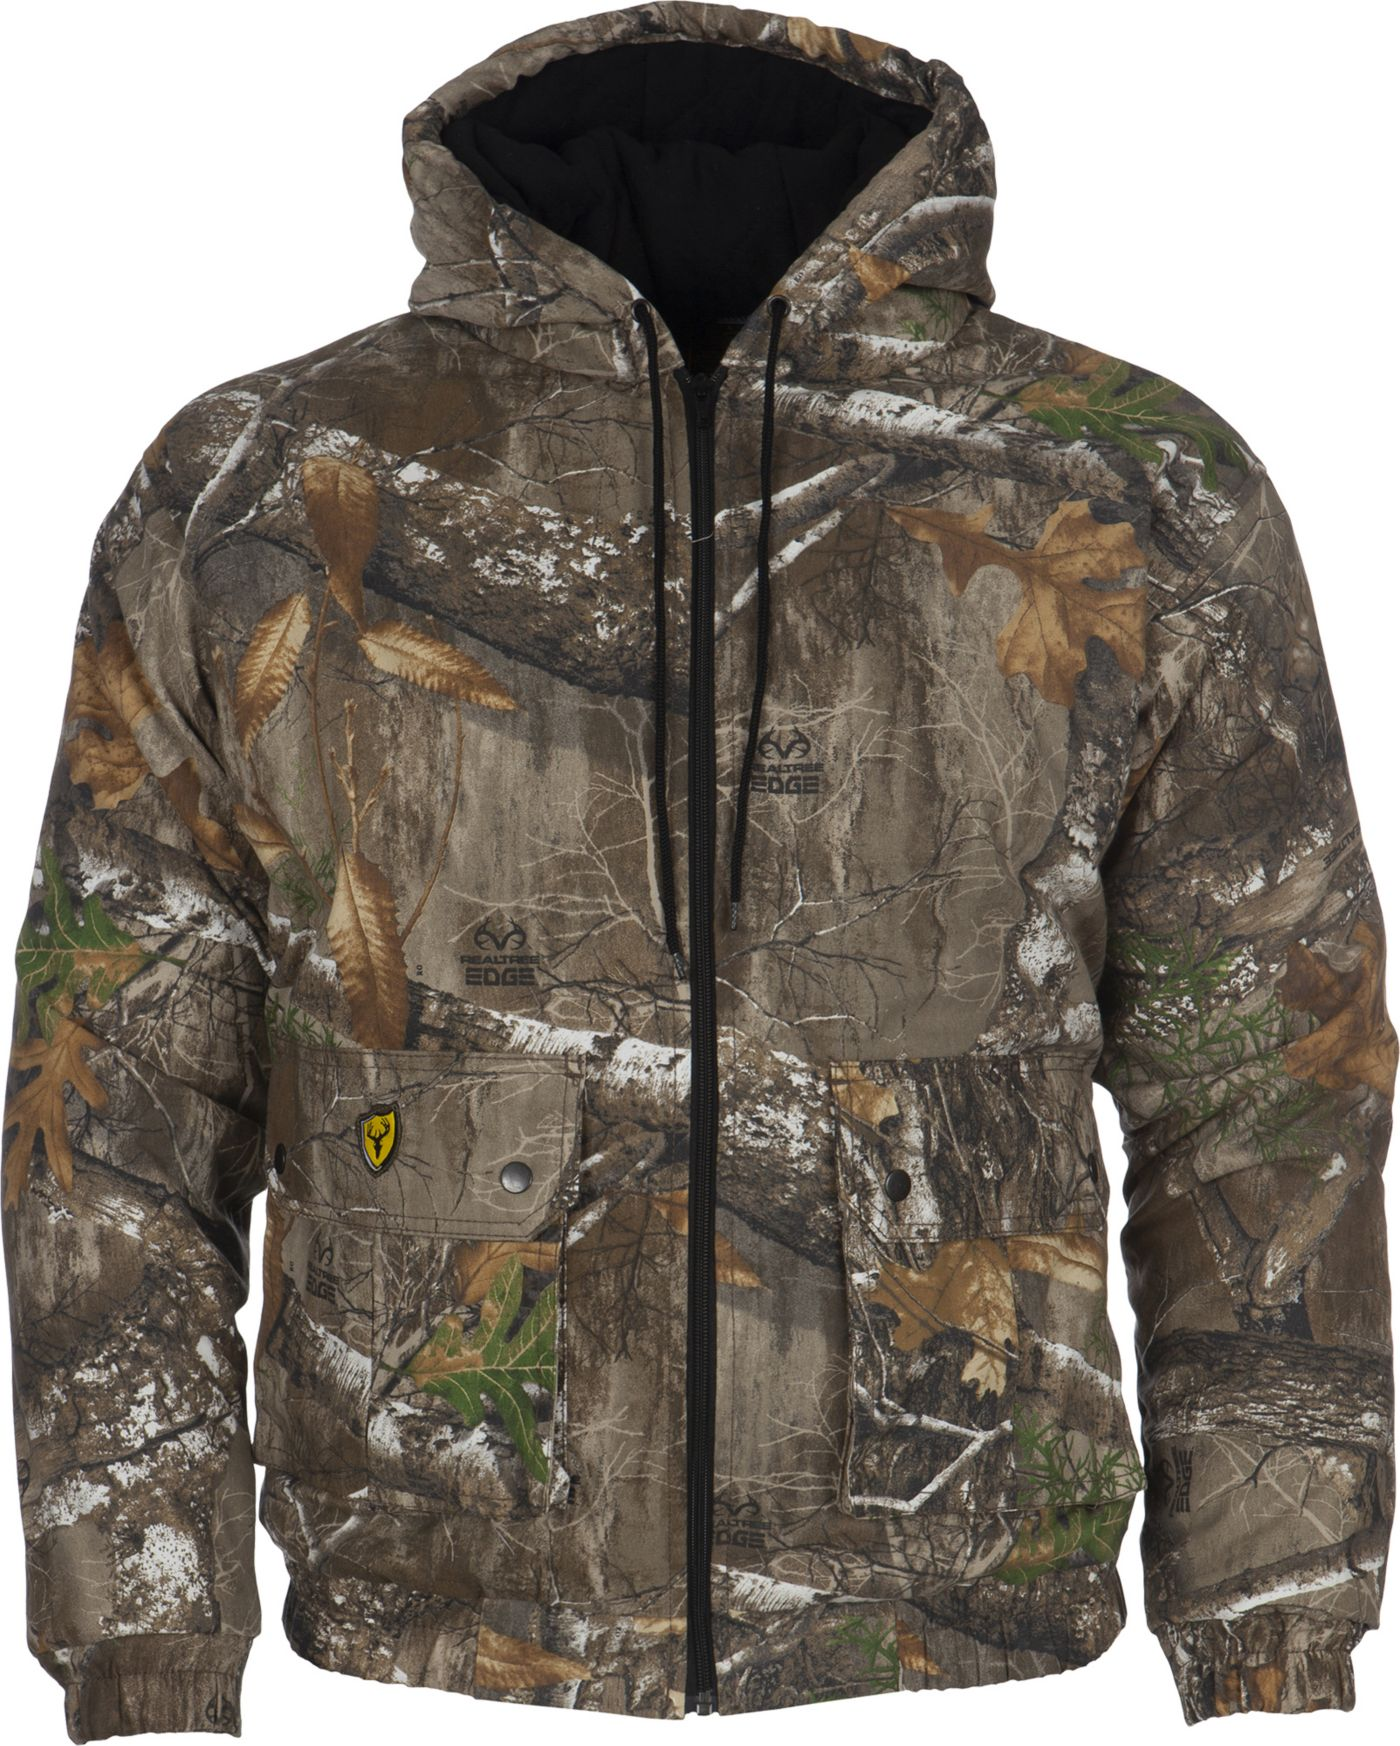 Blocker Outdoors Shield Series Youth Commander Jacket